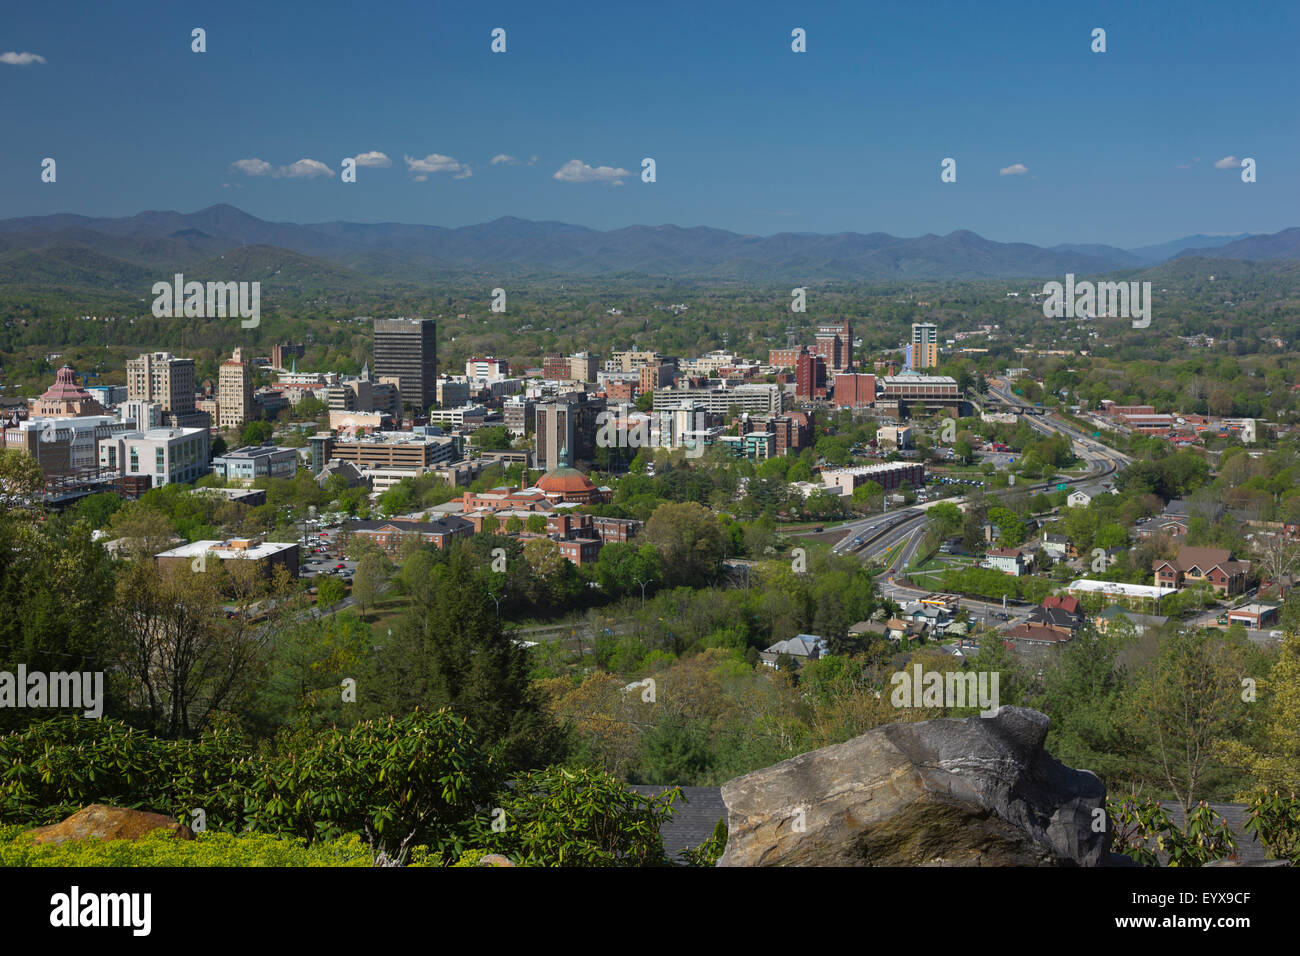 DOWNTOWN SKYLINE ASHEVILLE BUNCOMBE COUNTY NORTH CAROLINA USA - Stock Image